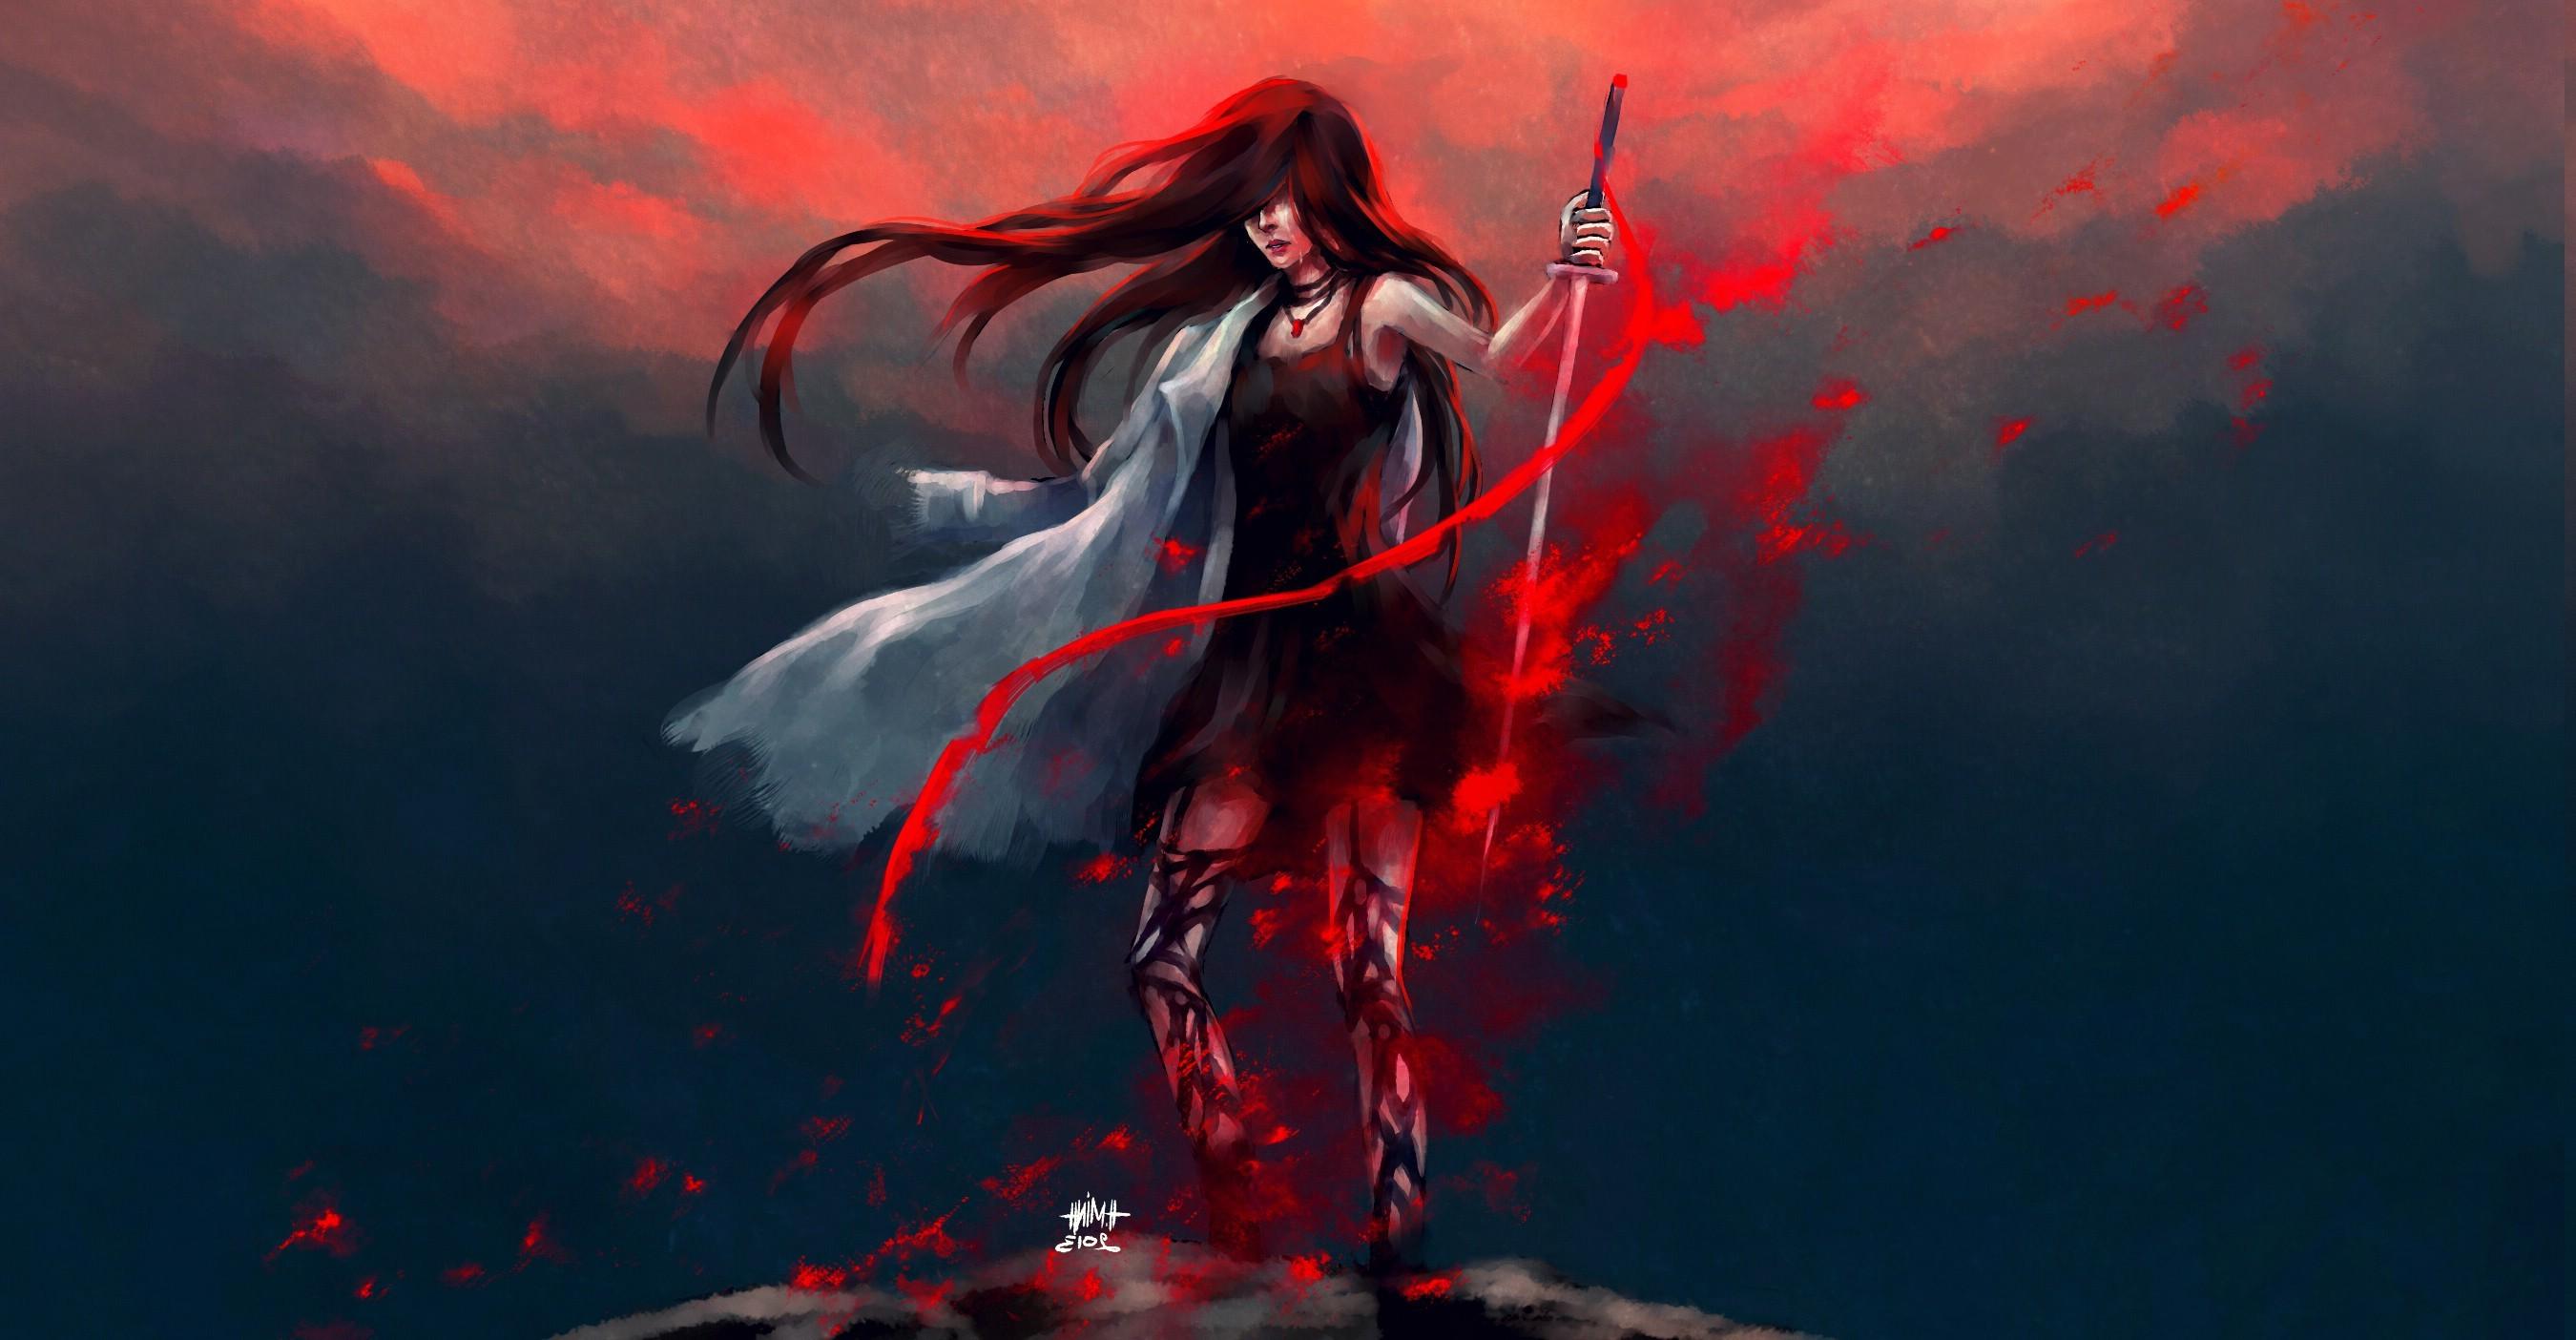 artwork, Fantasy Art, Anime, Warrior, Redhead, Blood, NanFe, Original